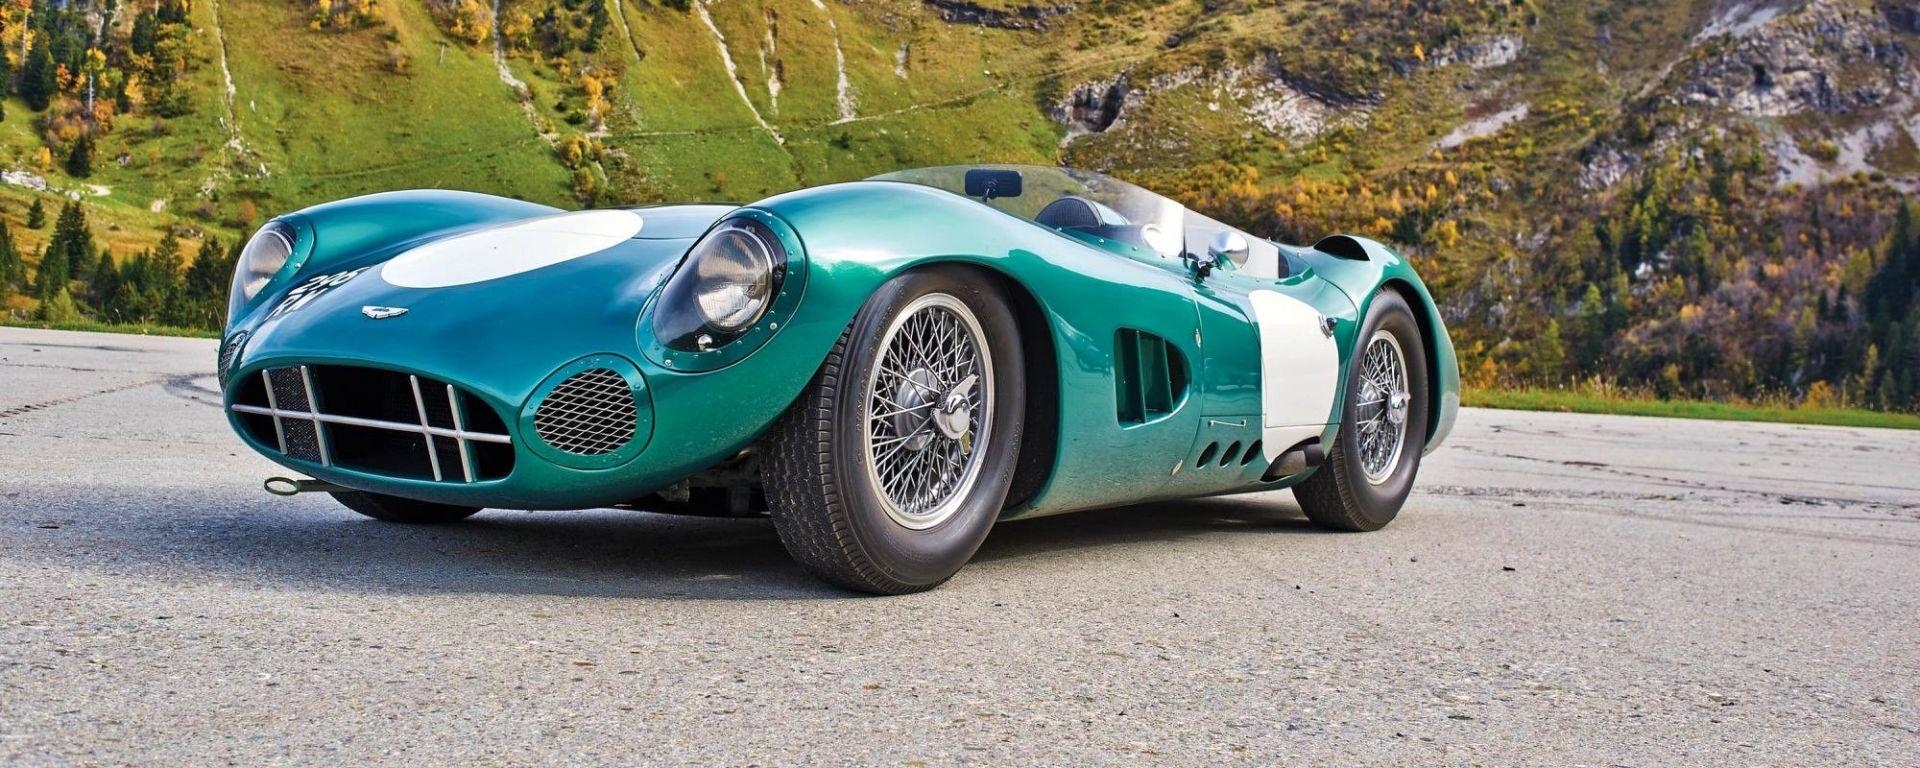 Aston Martin Speedster, super esclusiva ispirata a Le Mans 1959